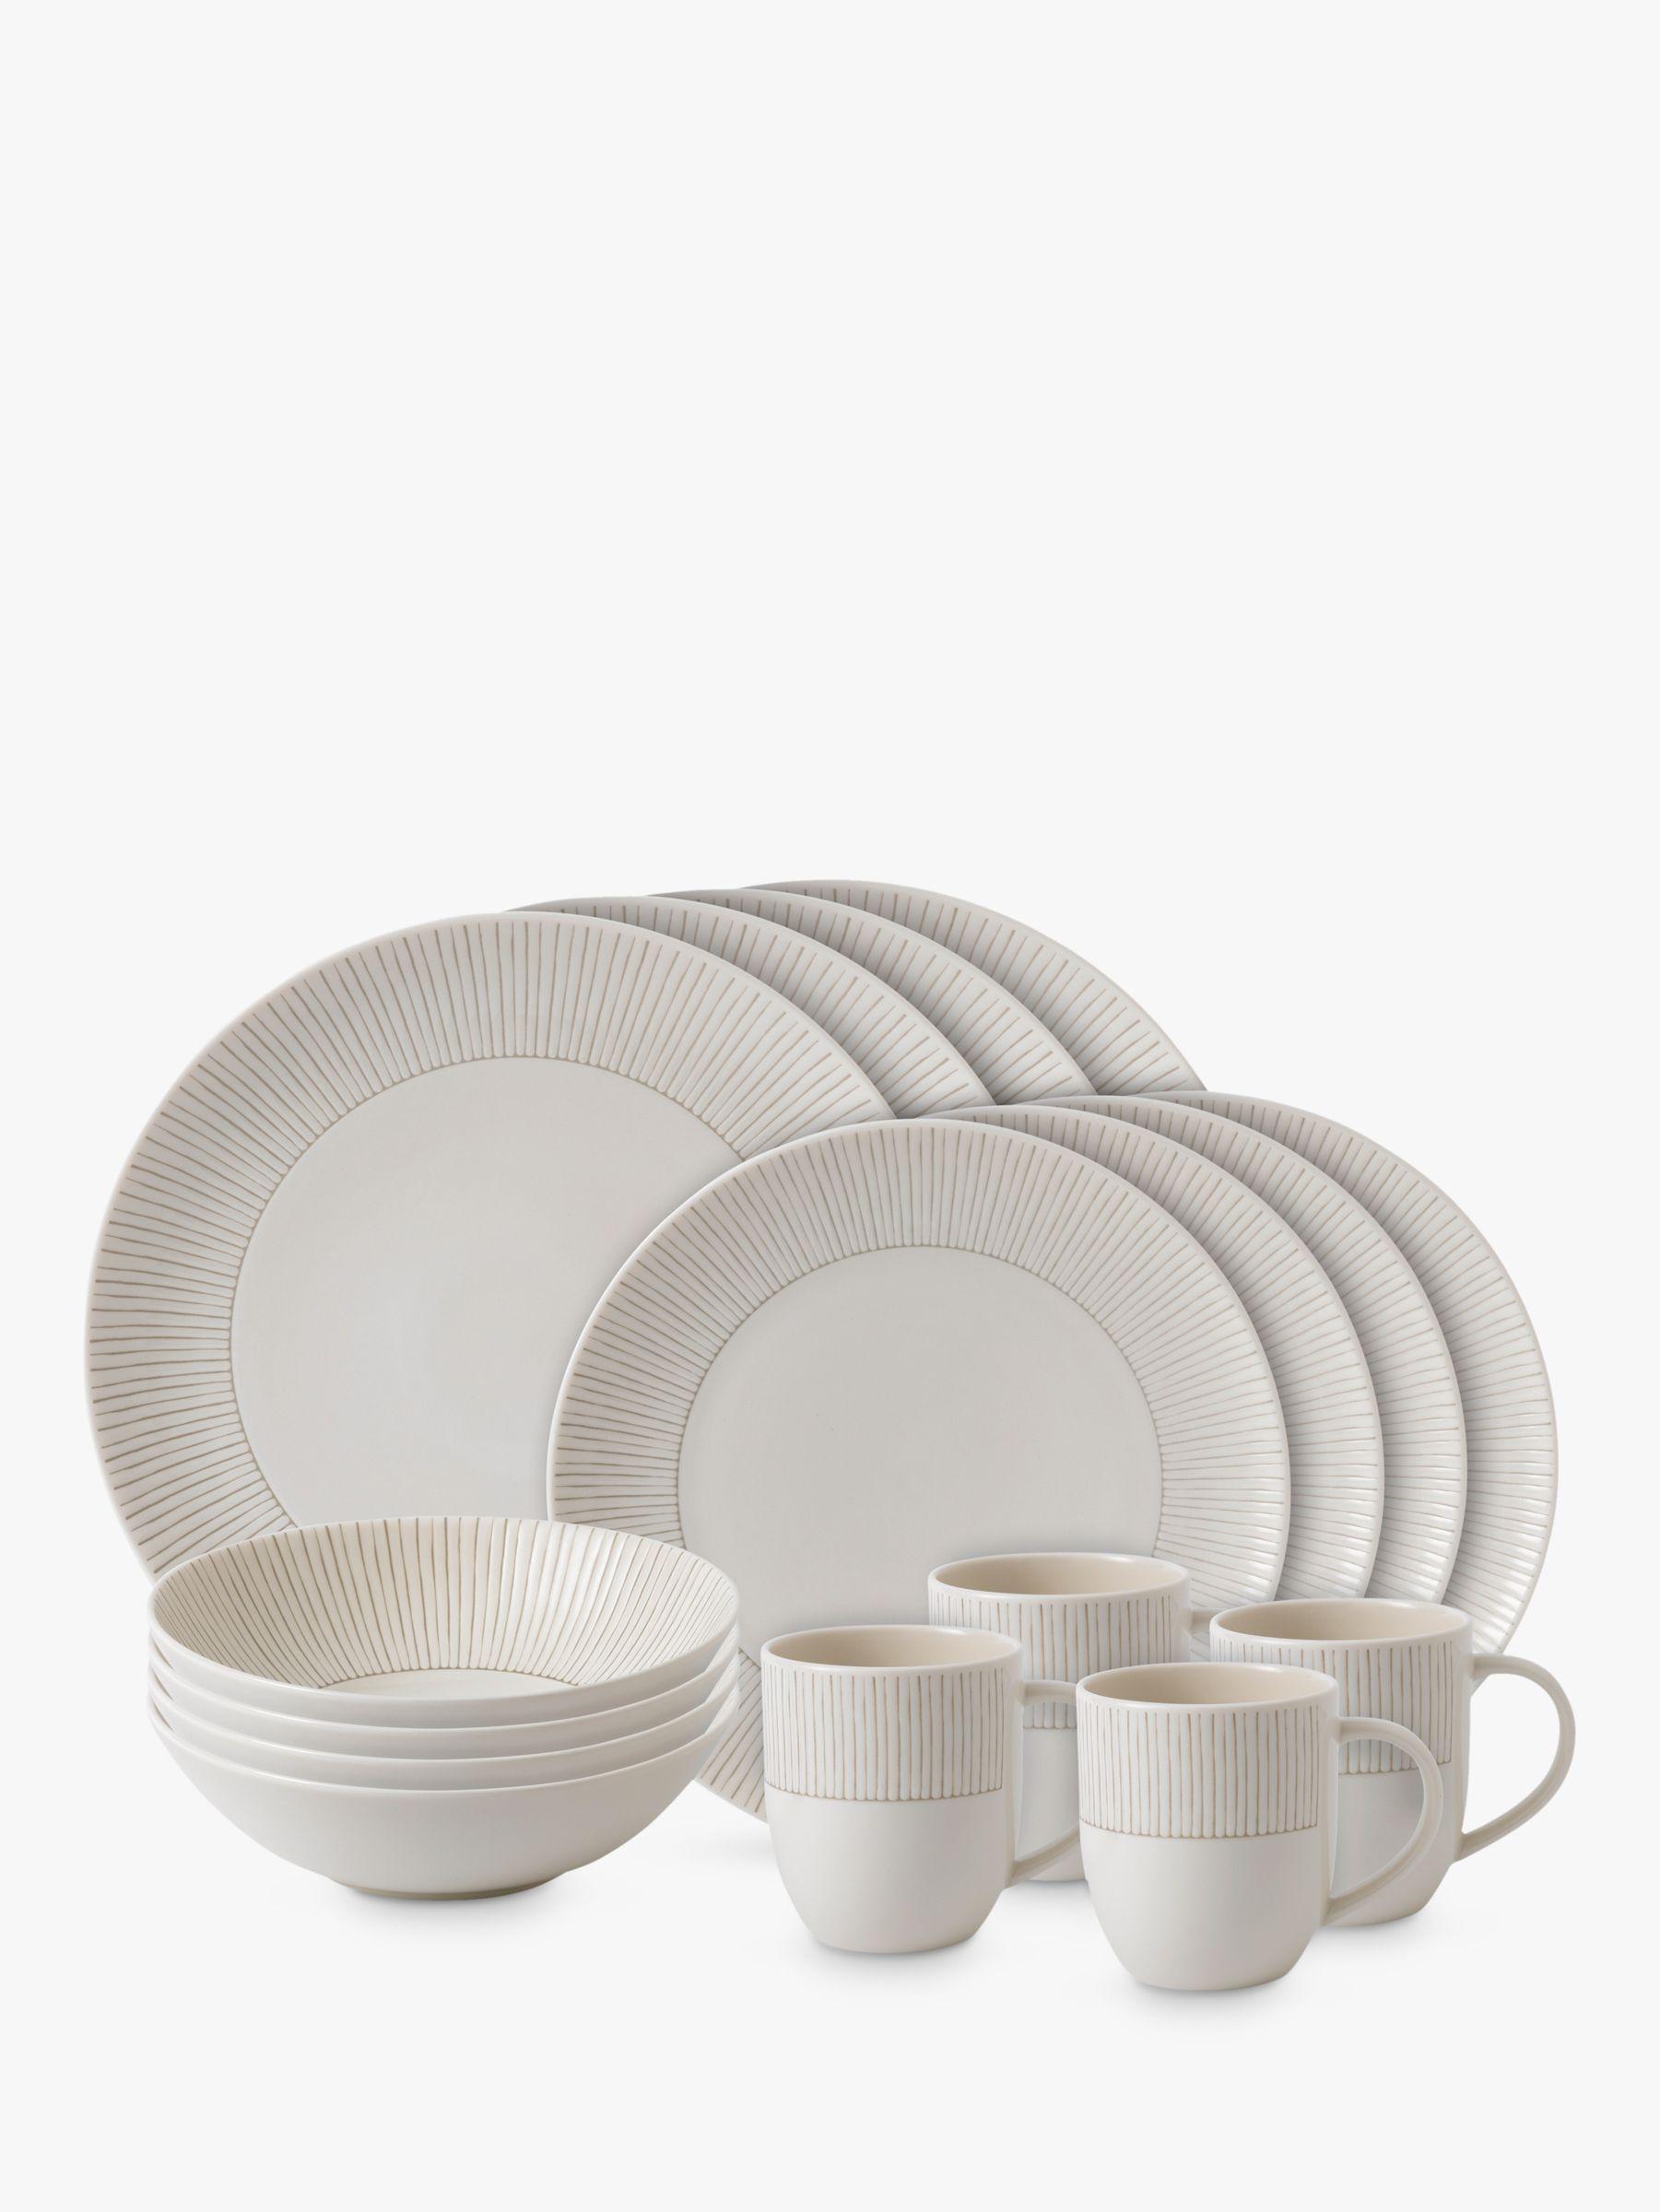 Royal Doulton ED Ellen DeGeneres for Royal Doulton Taupe Stripe Porcelain Set, 16 Piece